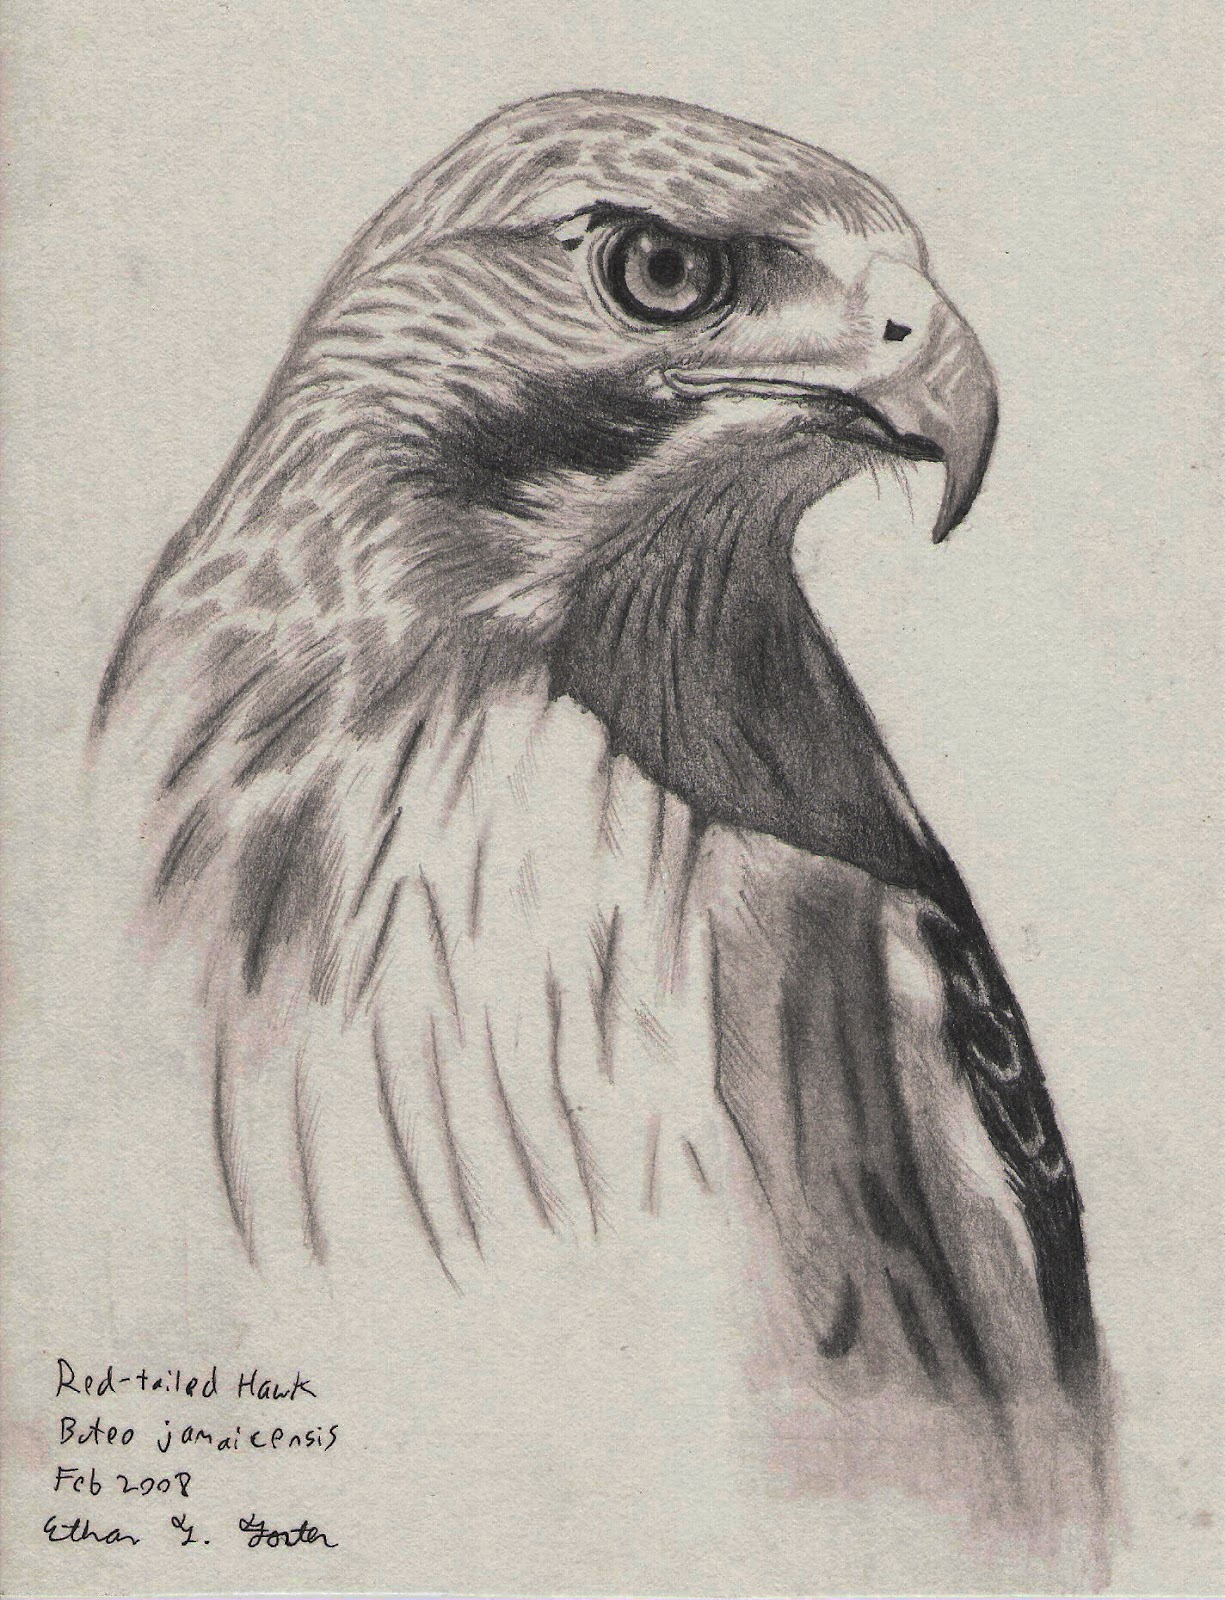 Hawk pencil drawing done in h hb b3 pencil